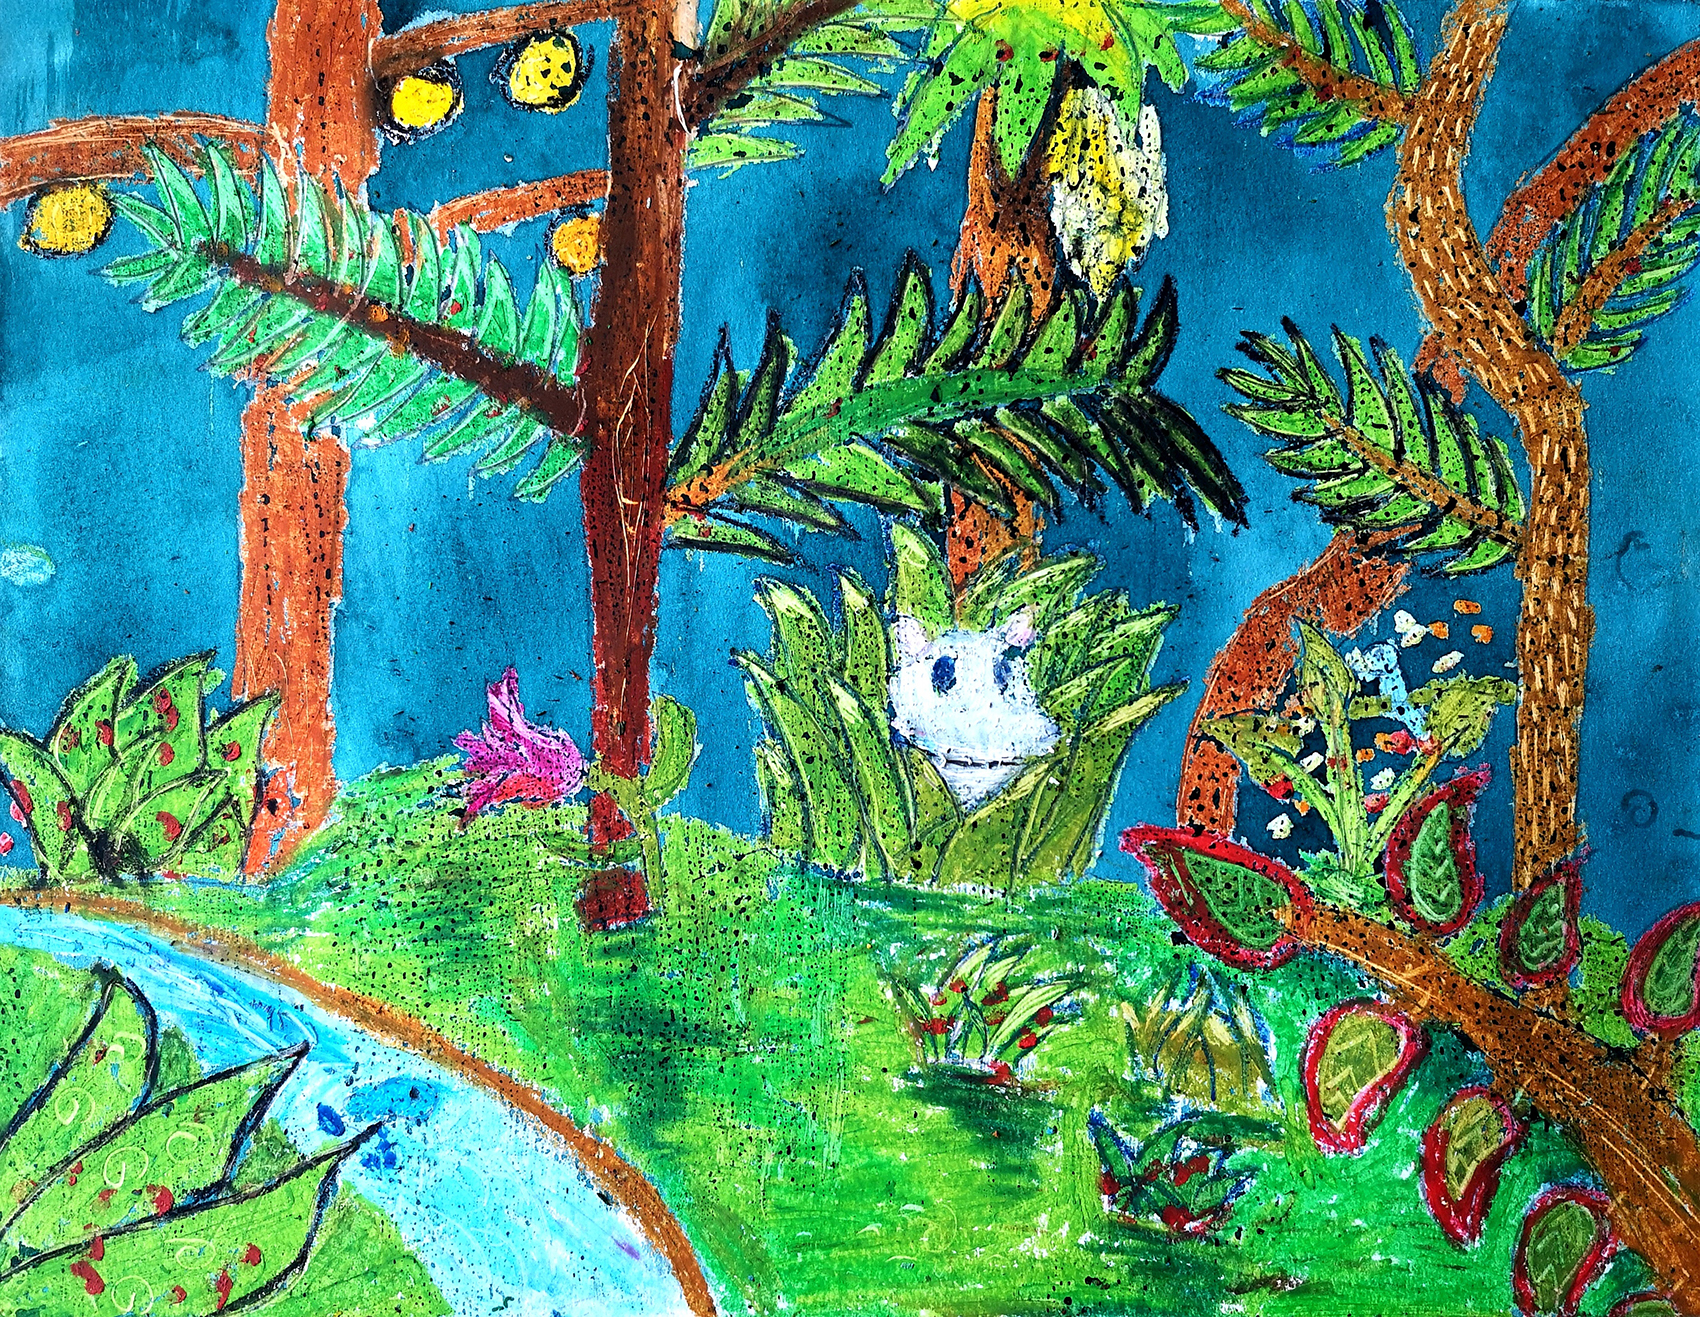 bulle créative - cours dessin hebdo enfants